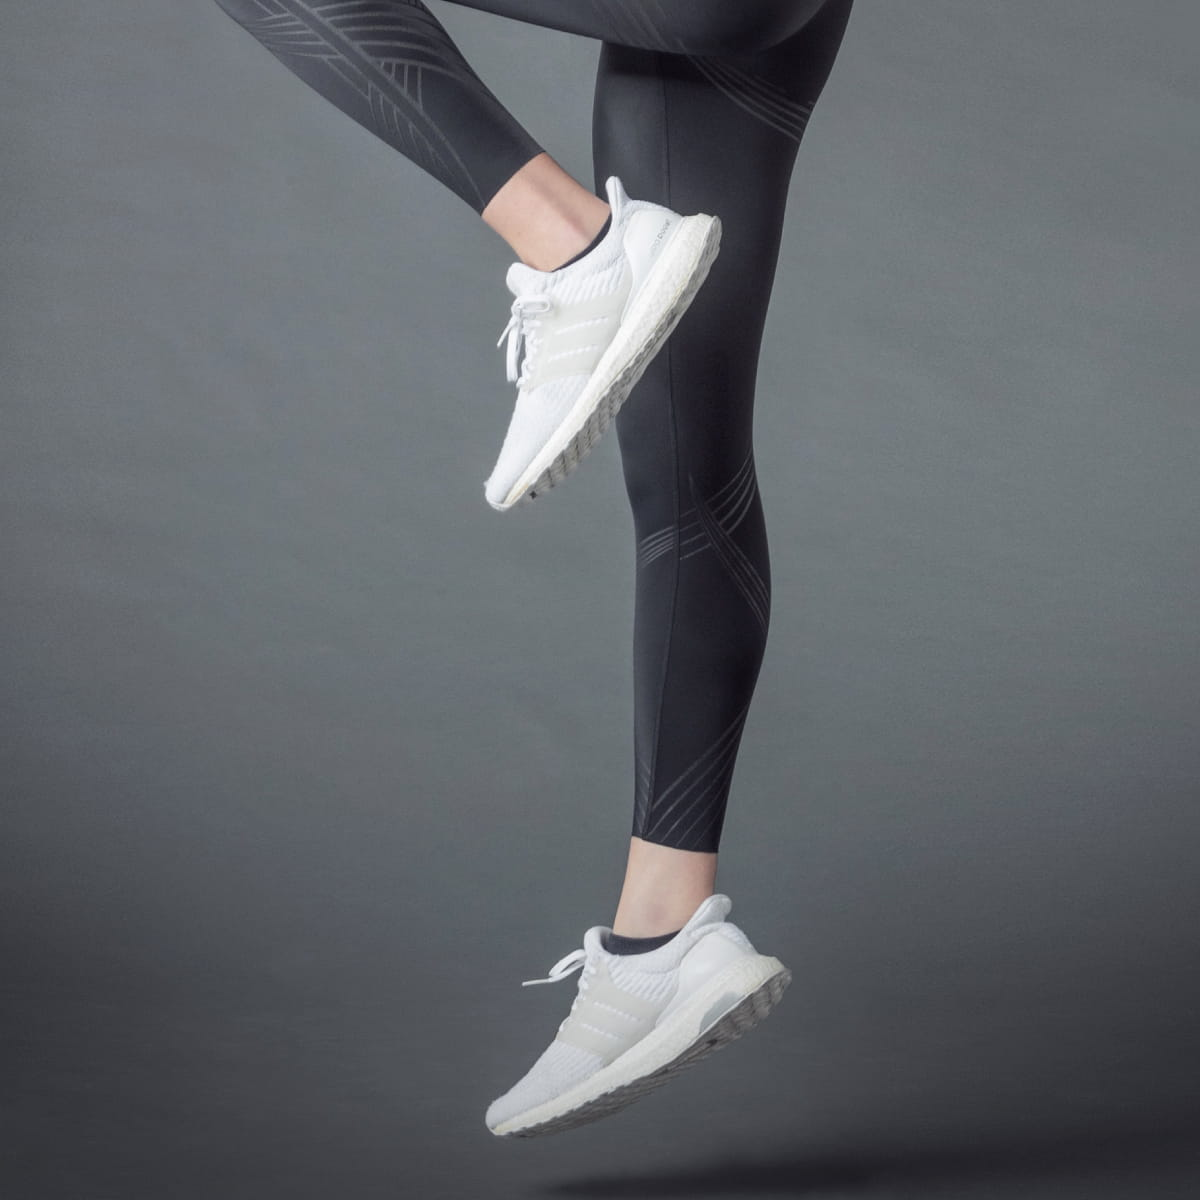 TENO超彈感美型健身褲-Track軌跡 18